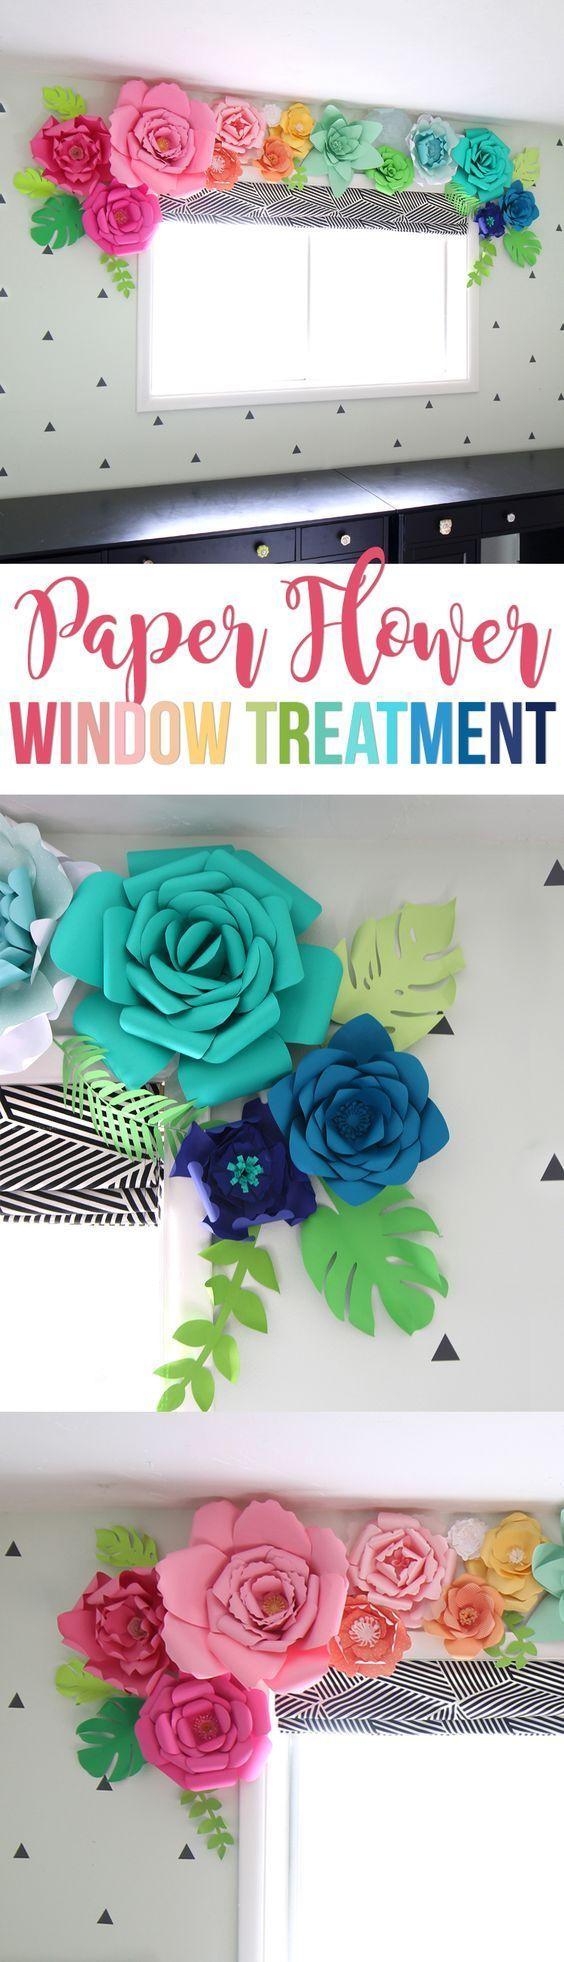 3D Paper Flower Window Treatment